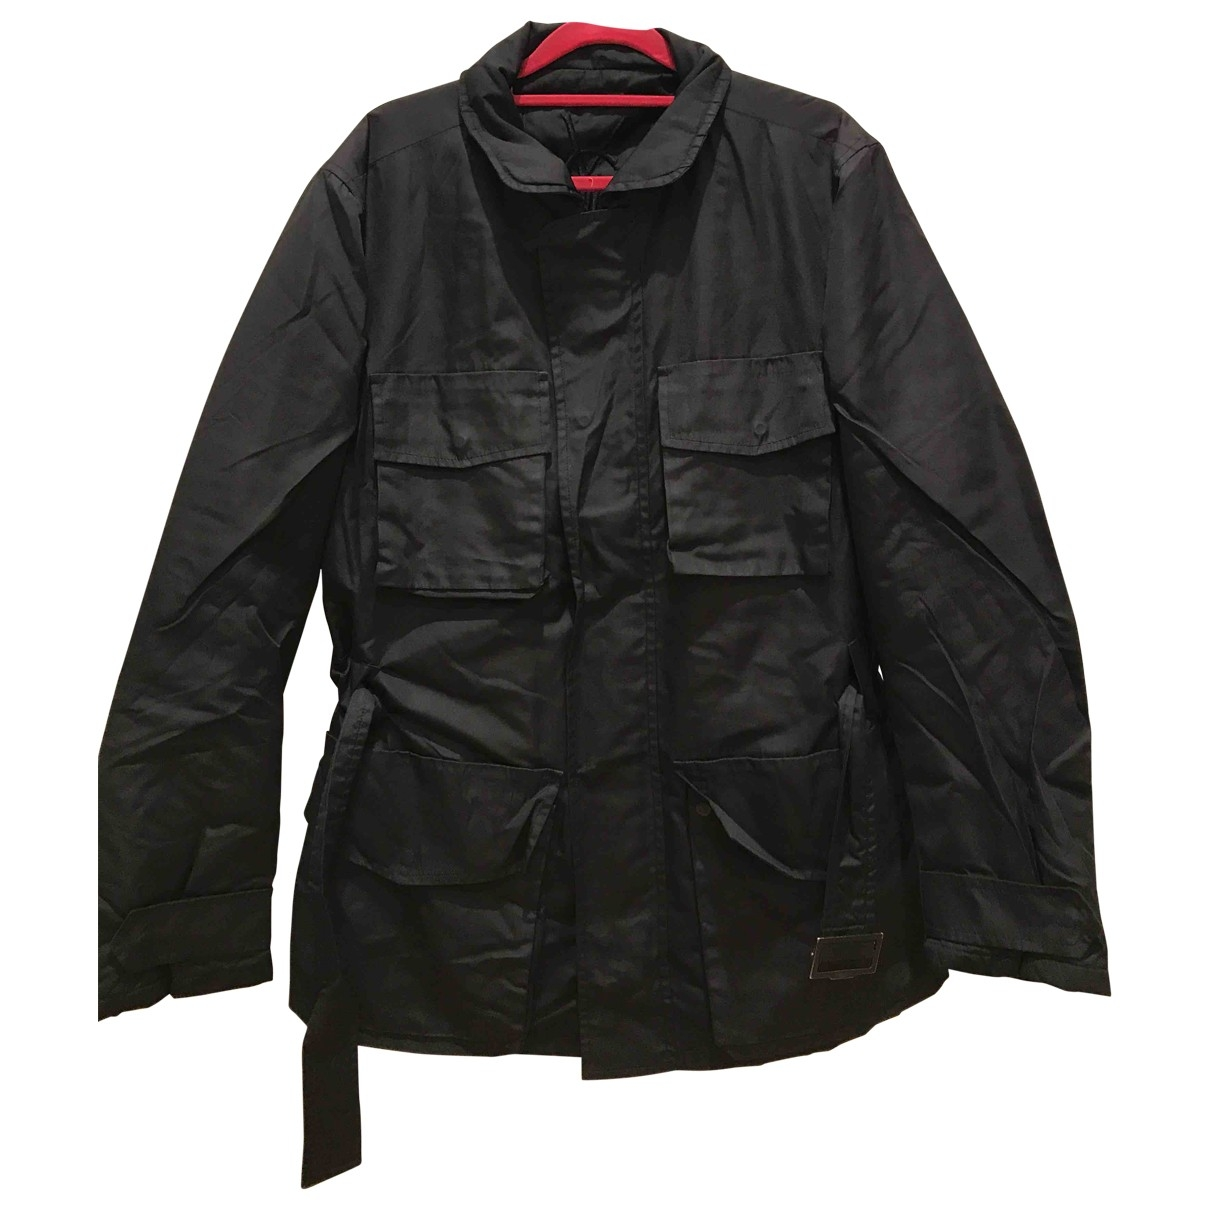 Yves Saint Laurent \N Black jacket  for Men 48 IT